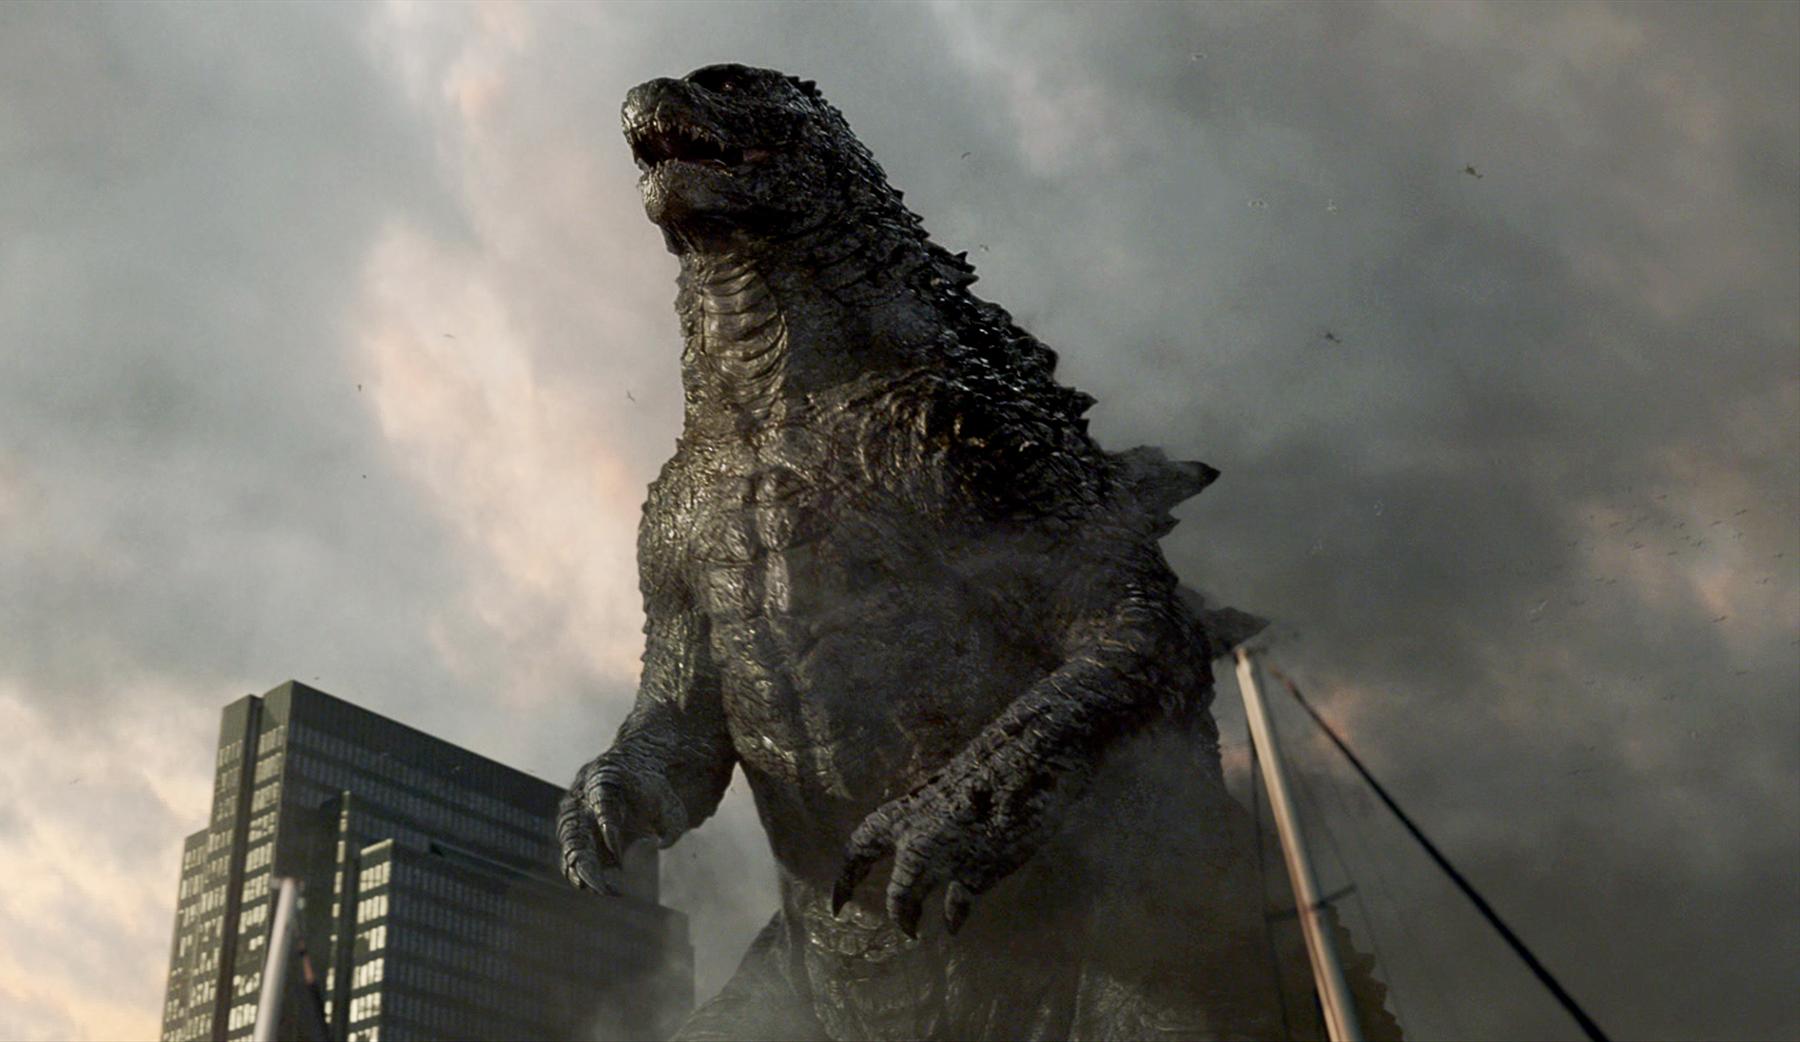 How Indie Director Gareth Edwards Built a Better Godzilla